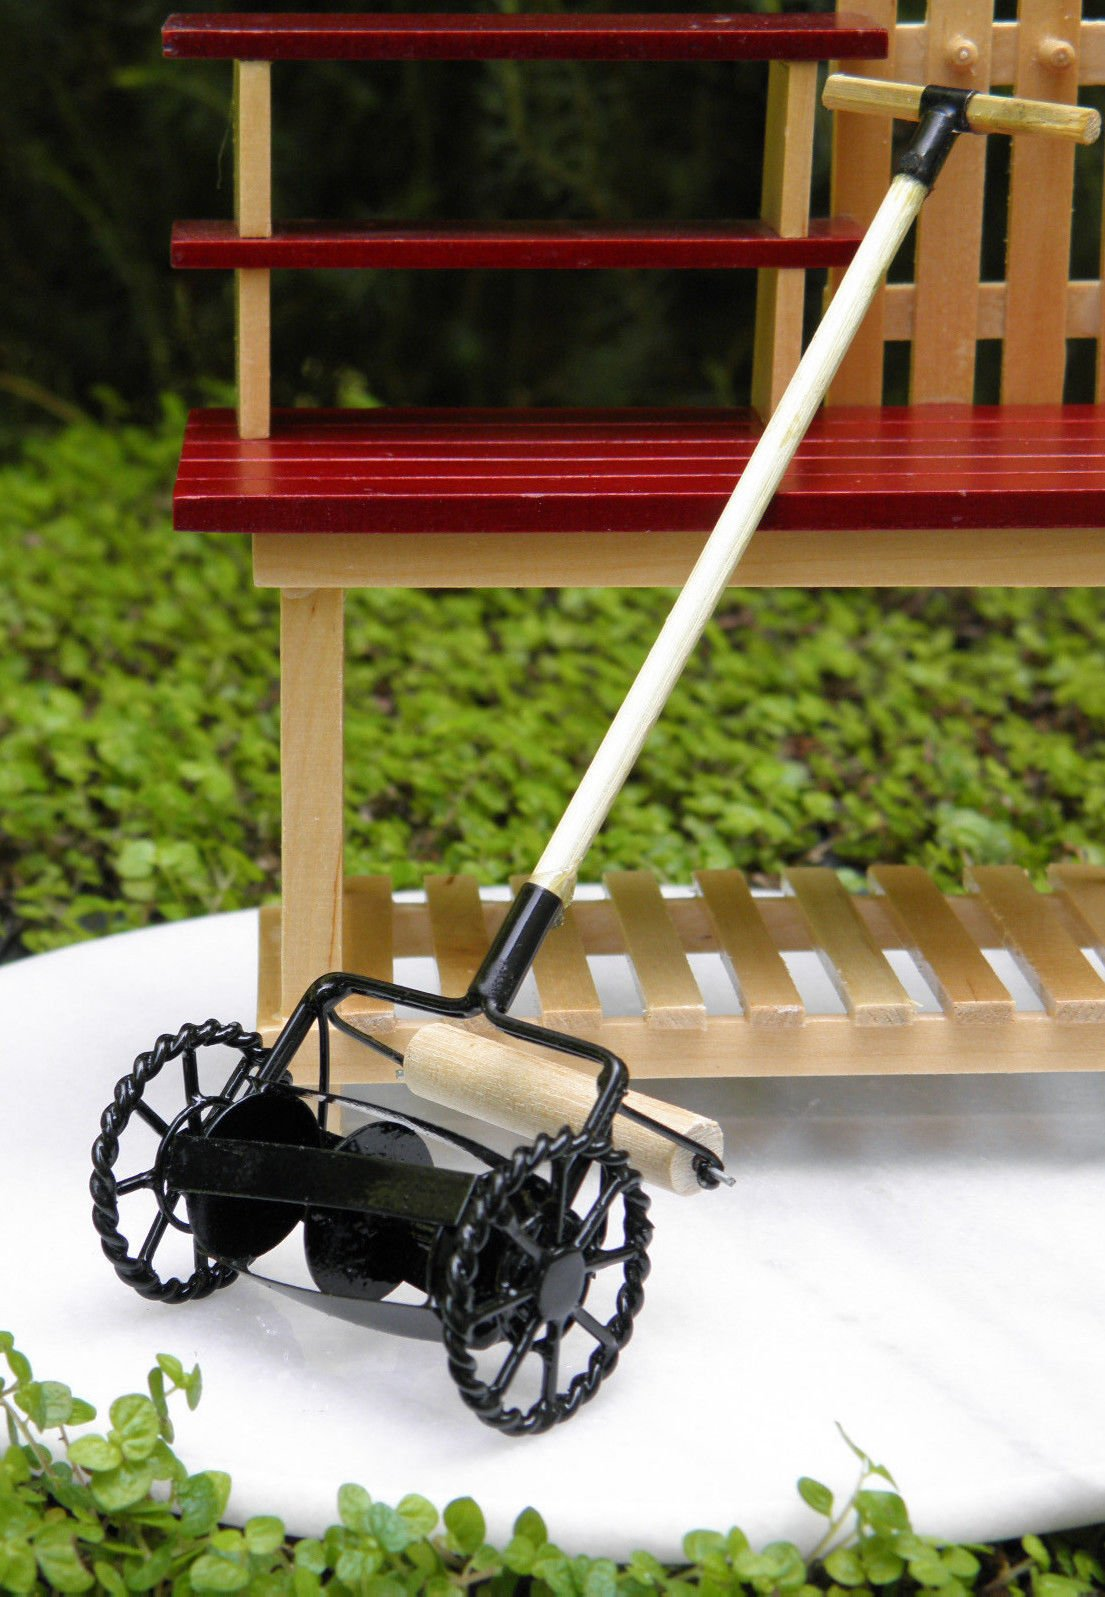 Miniature Dollhouse Fairy Garden Accessories Old-Fashioned Black Lawnmower